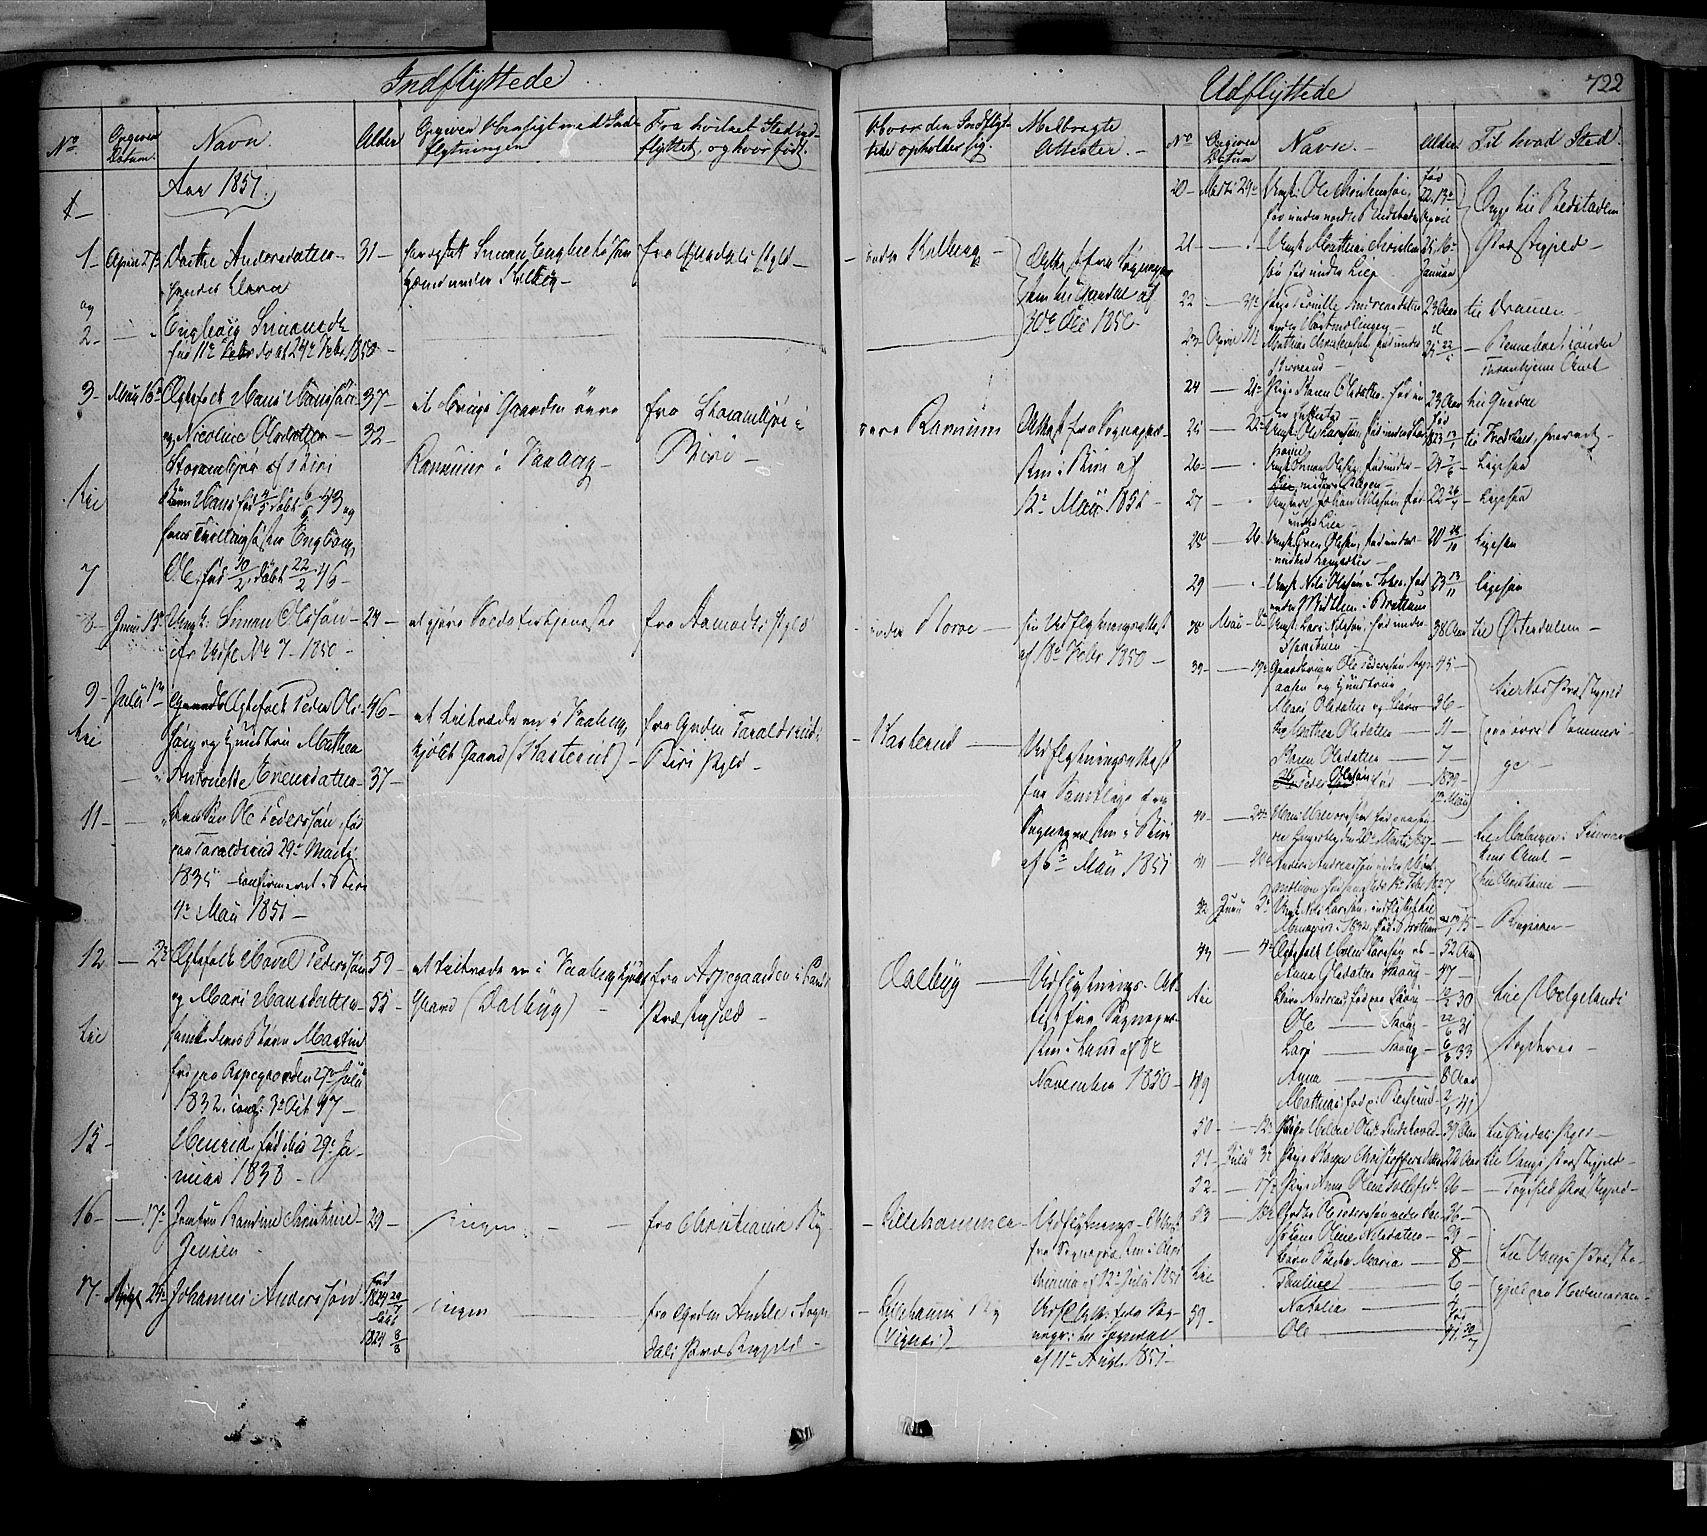 SAH, Fåberg prestekontor, Ministerialbok nr. 5, 1836-1854, s. 721-722